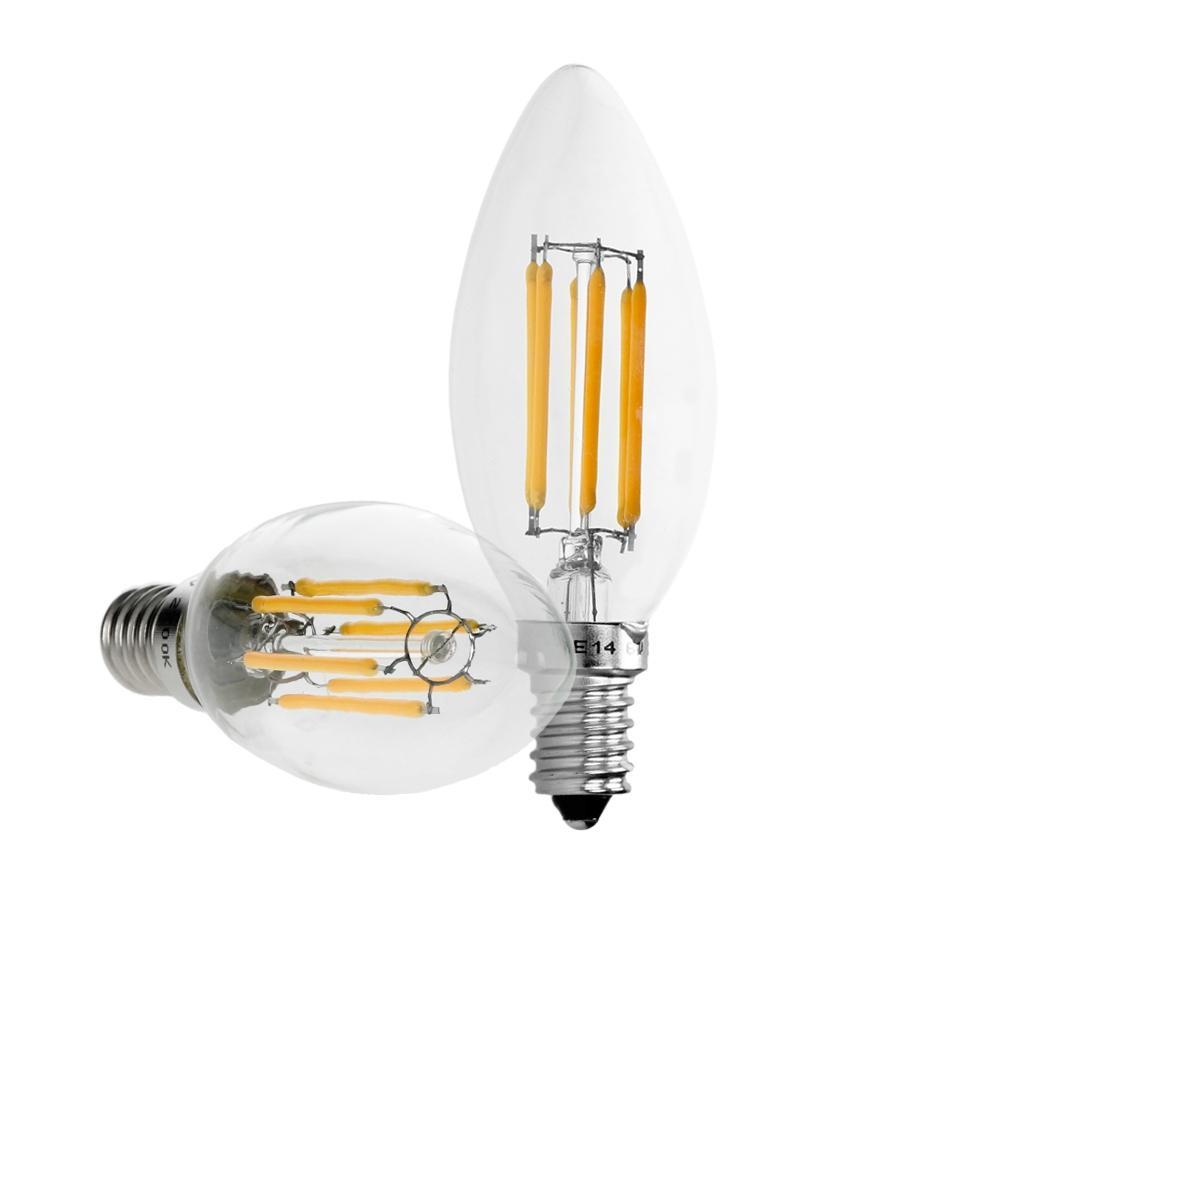 Ecd Germany 5 x lampe LED filament de bougie E14 6W blanc chaud